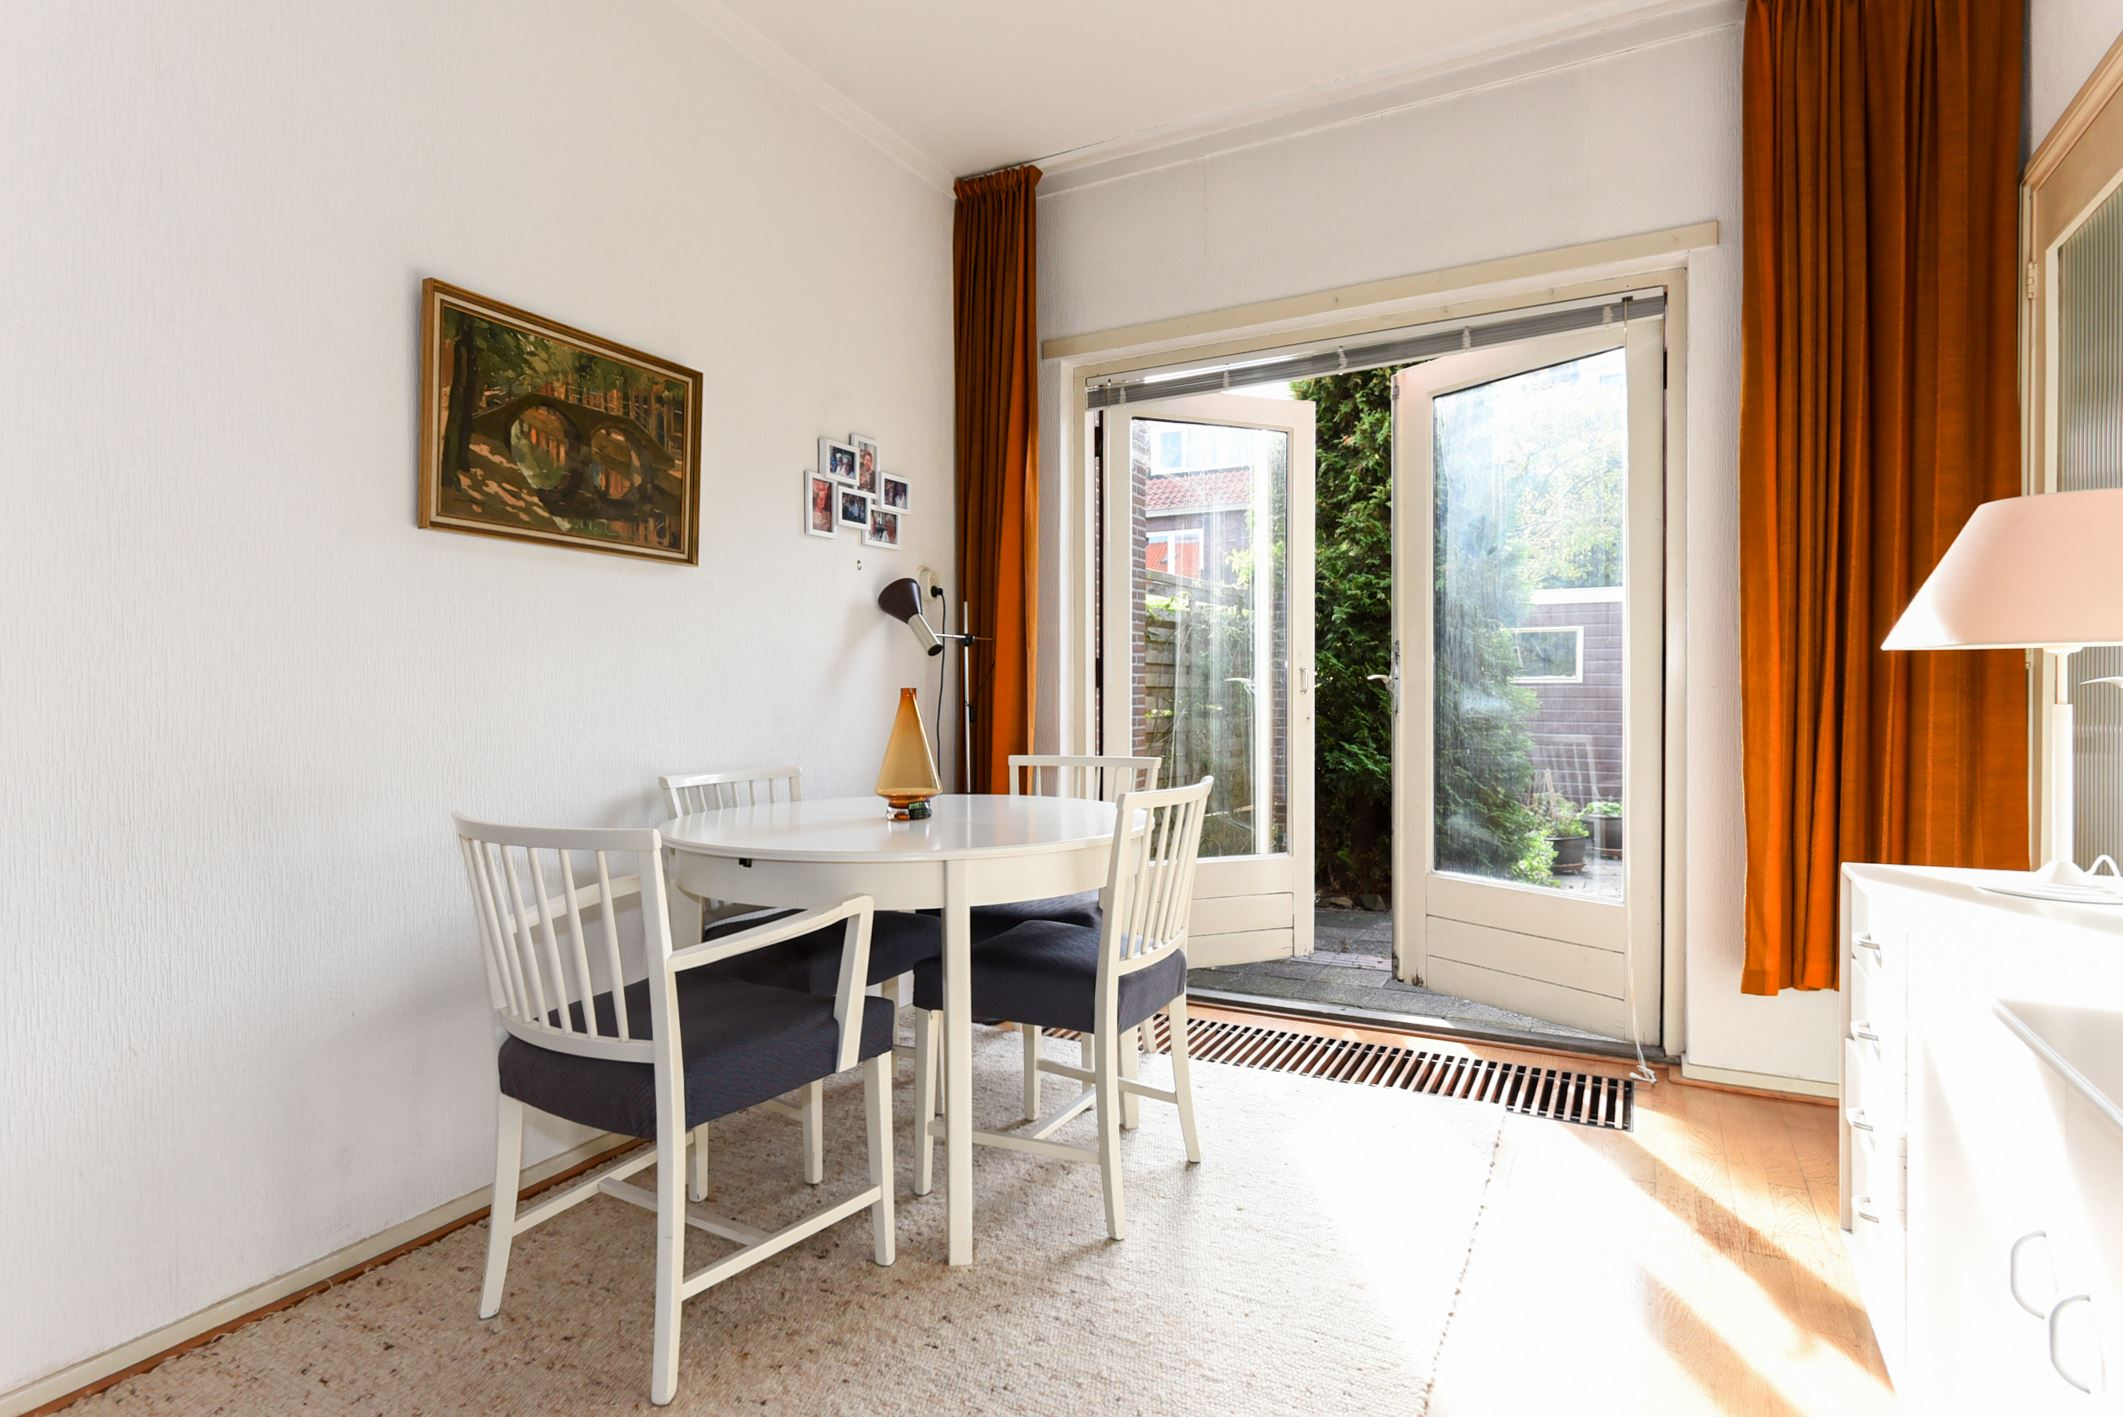 Huis te koop: tak van poortvlietstraat 31 2613 wg delft [funda]